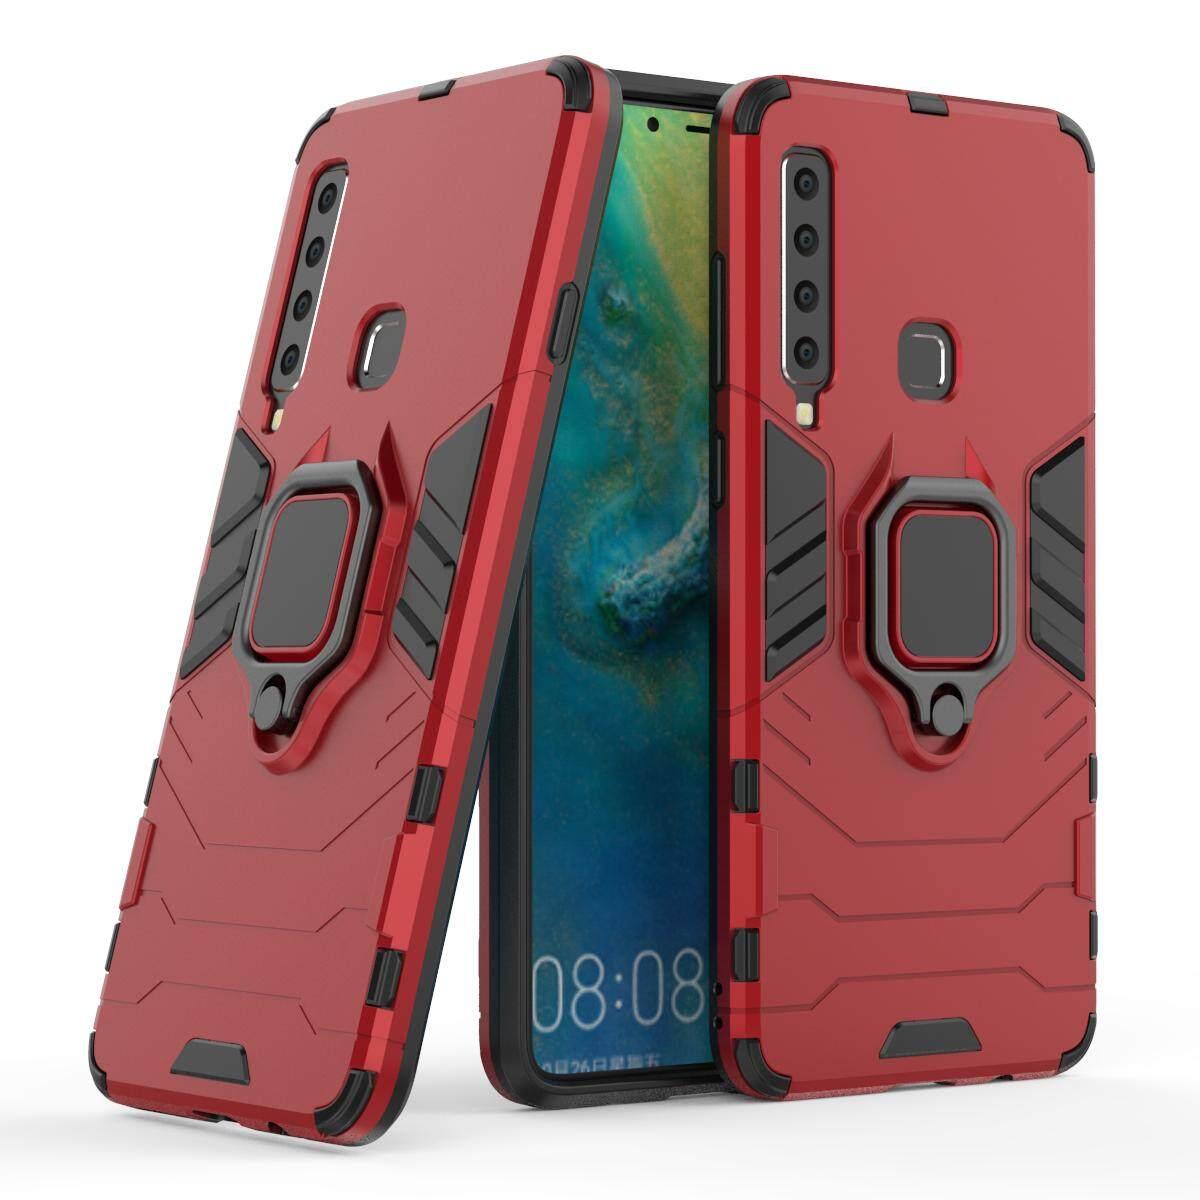 Beruang Besi Pelindung Tahan Benturan Casing Ponsel untuk Samsung Galaxy A9 (2019) Mewah Tpu Pelindung Kotak Sarung Keras dengan Pemegang Casing